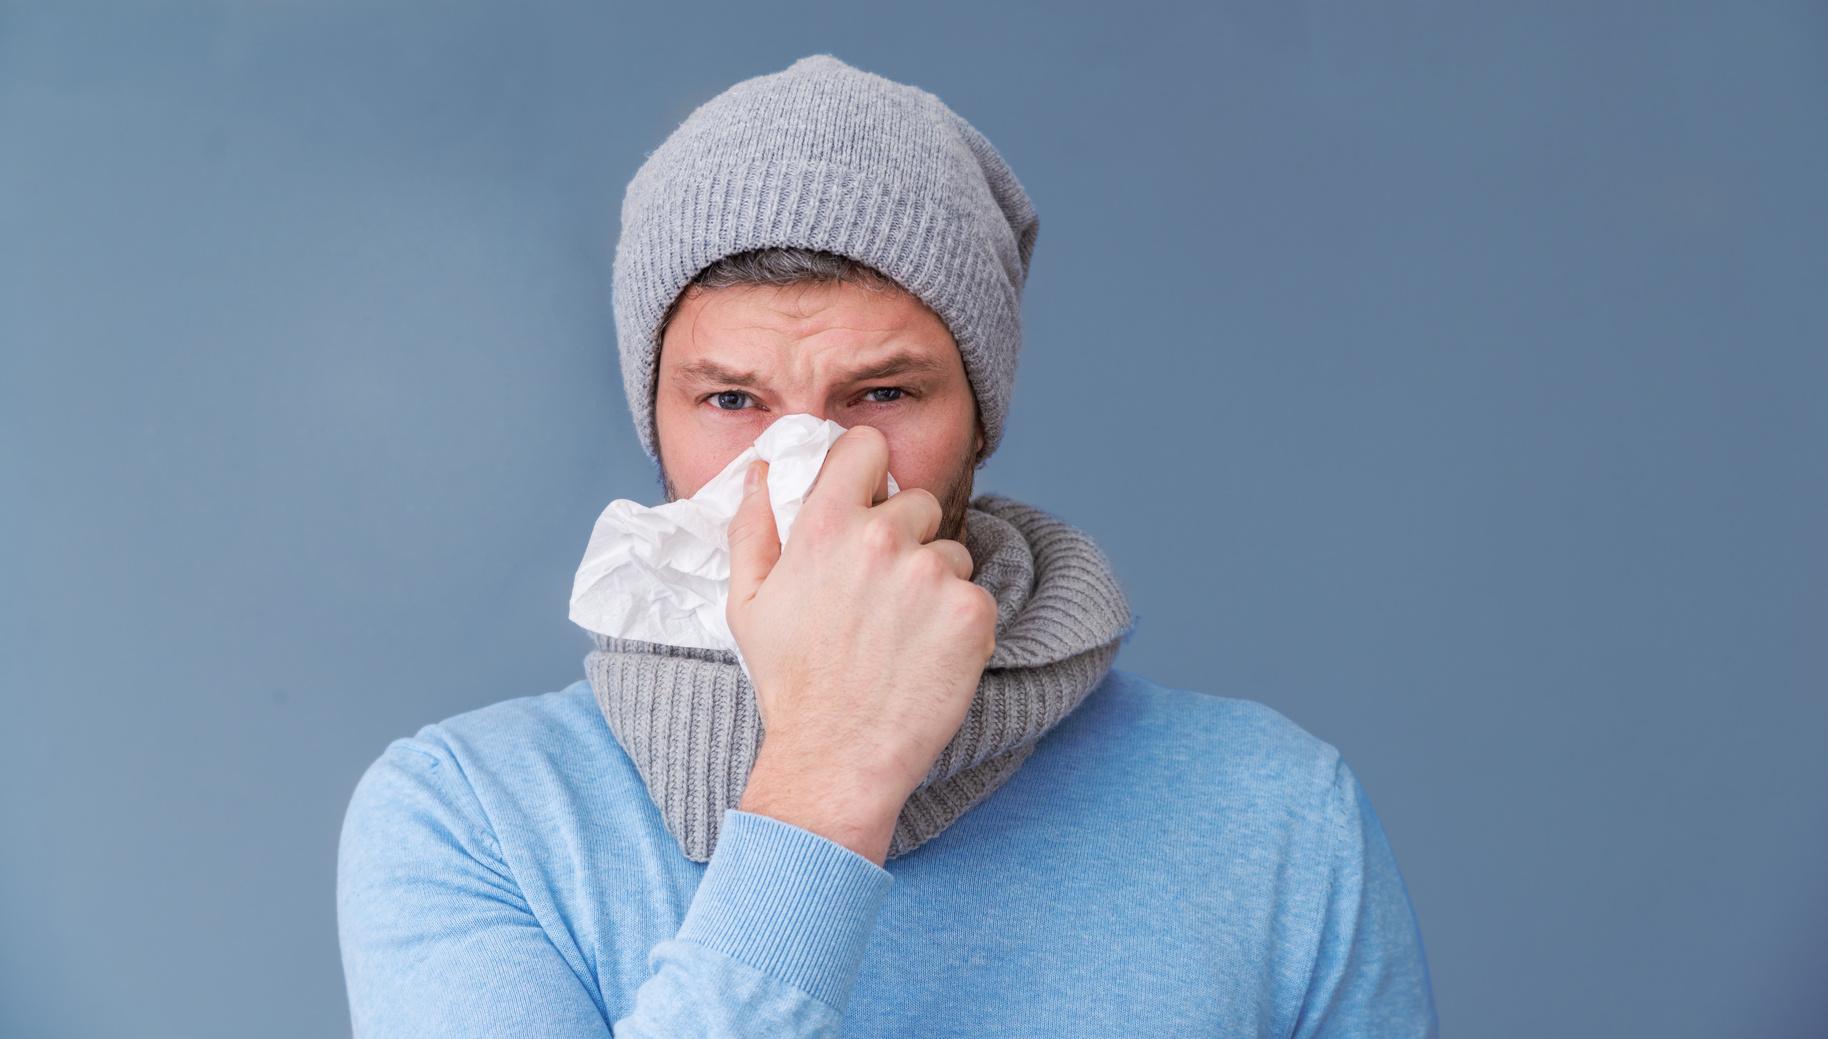 Anwesenheitsprämie fördert das Kranksein